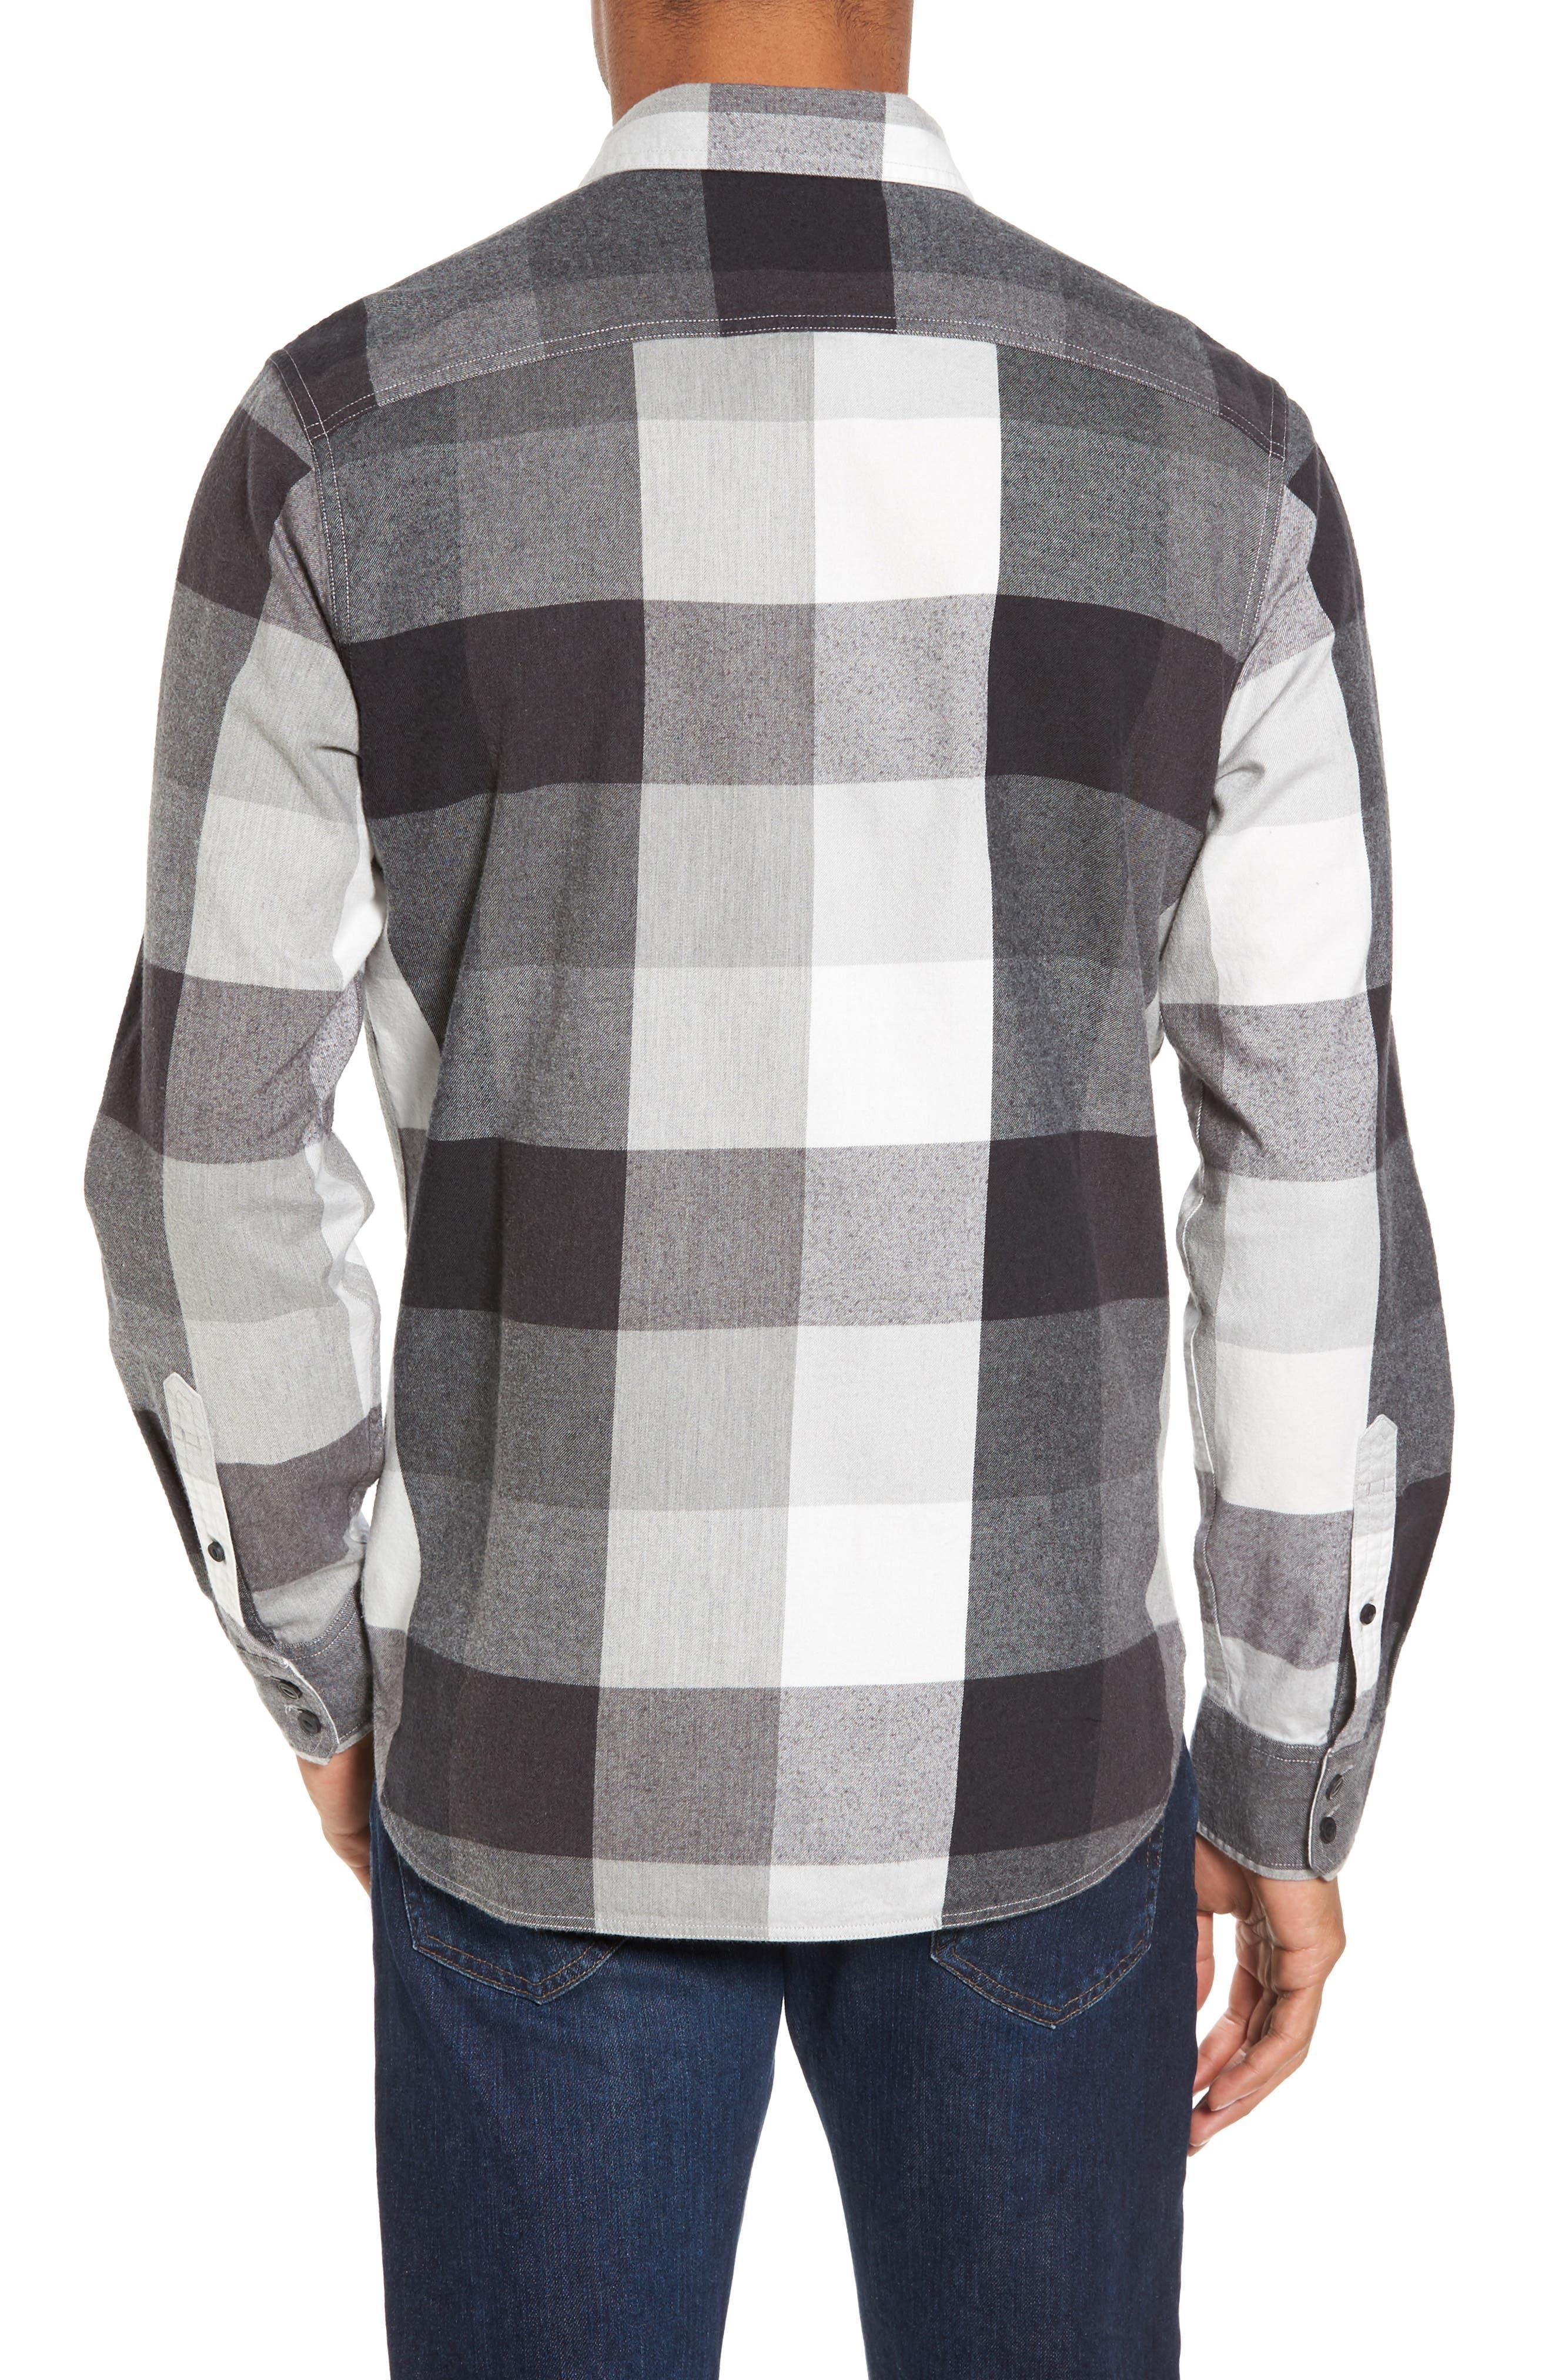 Trim Fit Workwear Check Flannel Shirt,                             Alternate thumbnail 2, color,                             Grey Paloma Buffalo Plaid